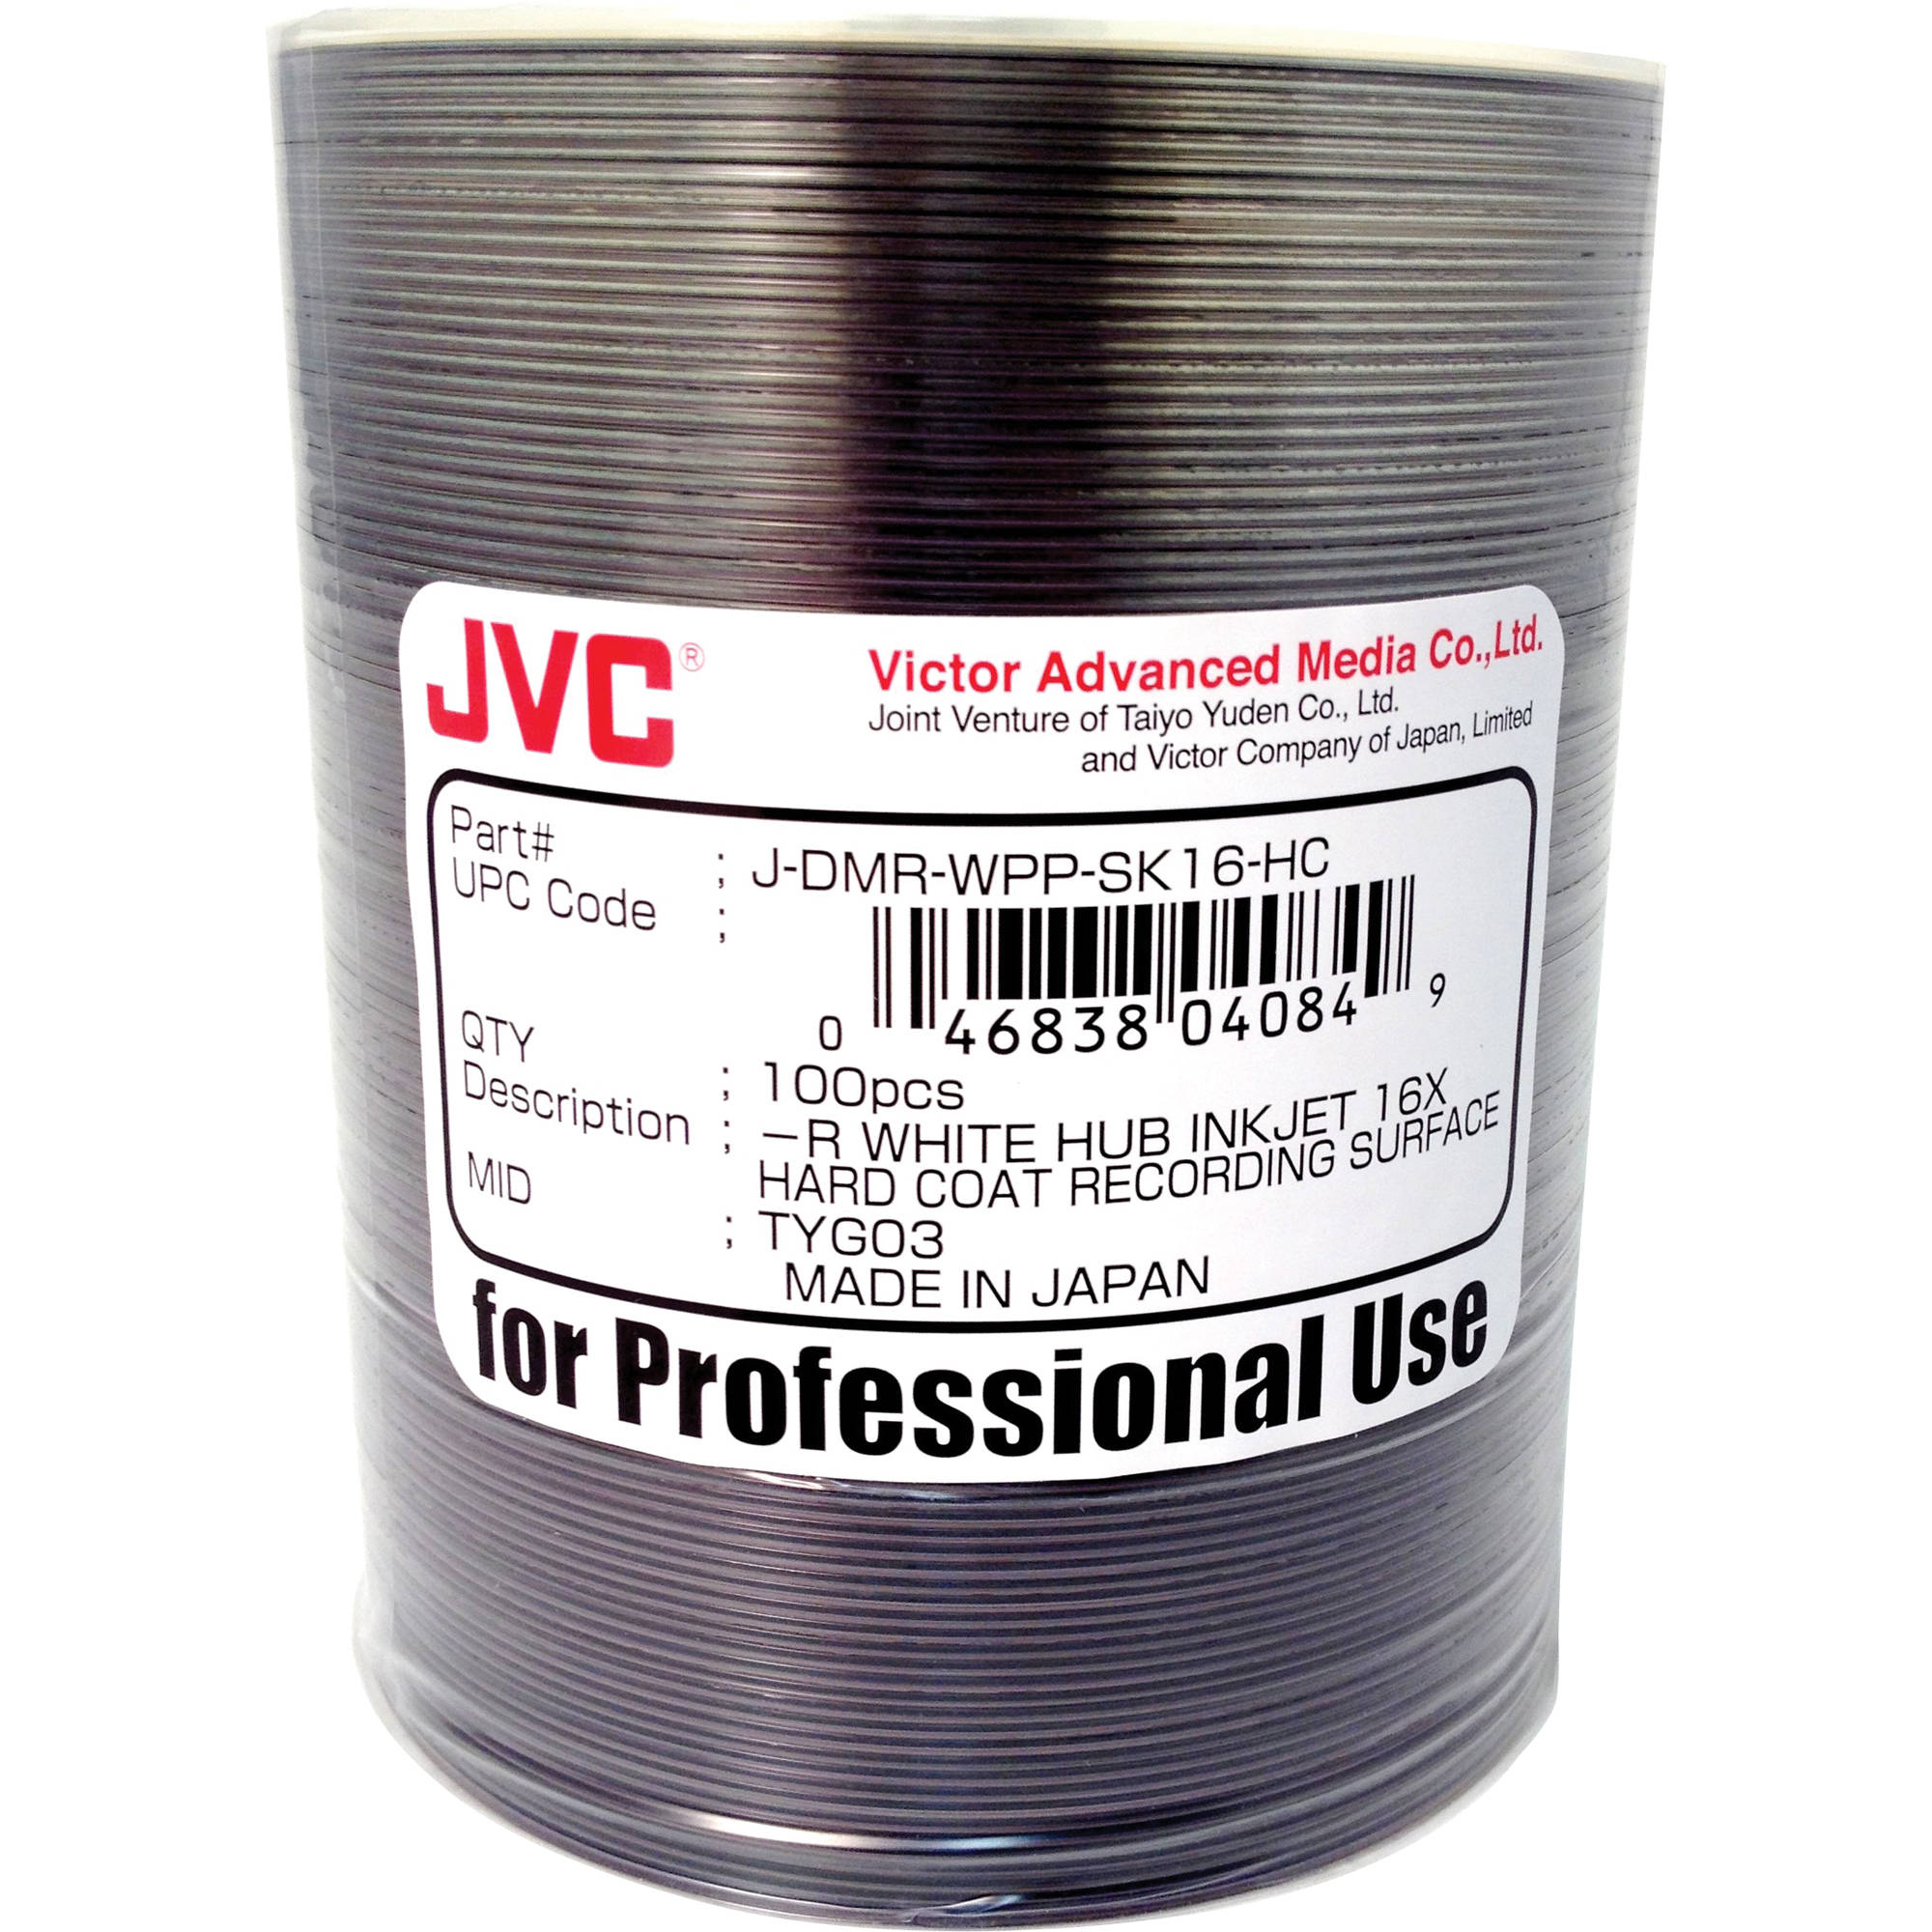 image regarding Printable Dvd Rs known as JVC Hardcoat 16x Recordable White Hub Inkjet Printable DVD-R (100-Pack)